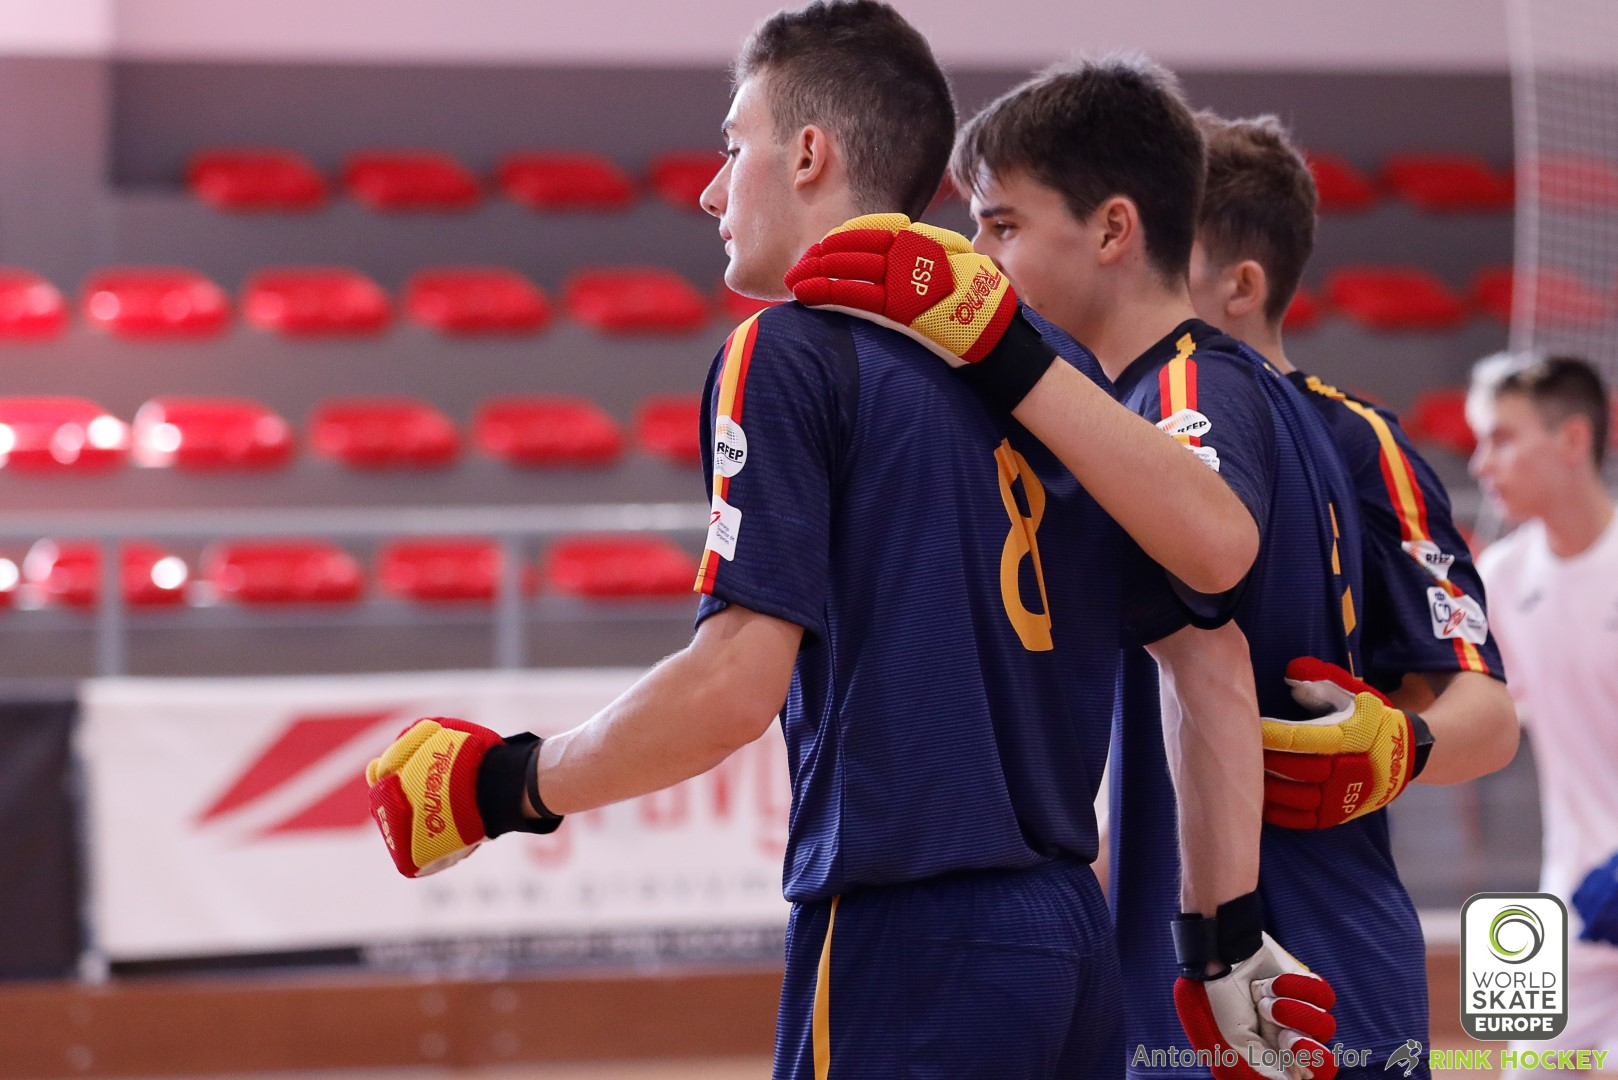 Espanha-com-Israel-348-Large